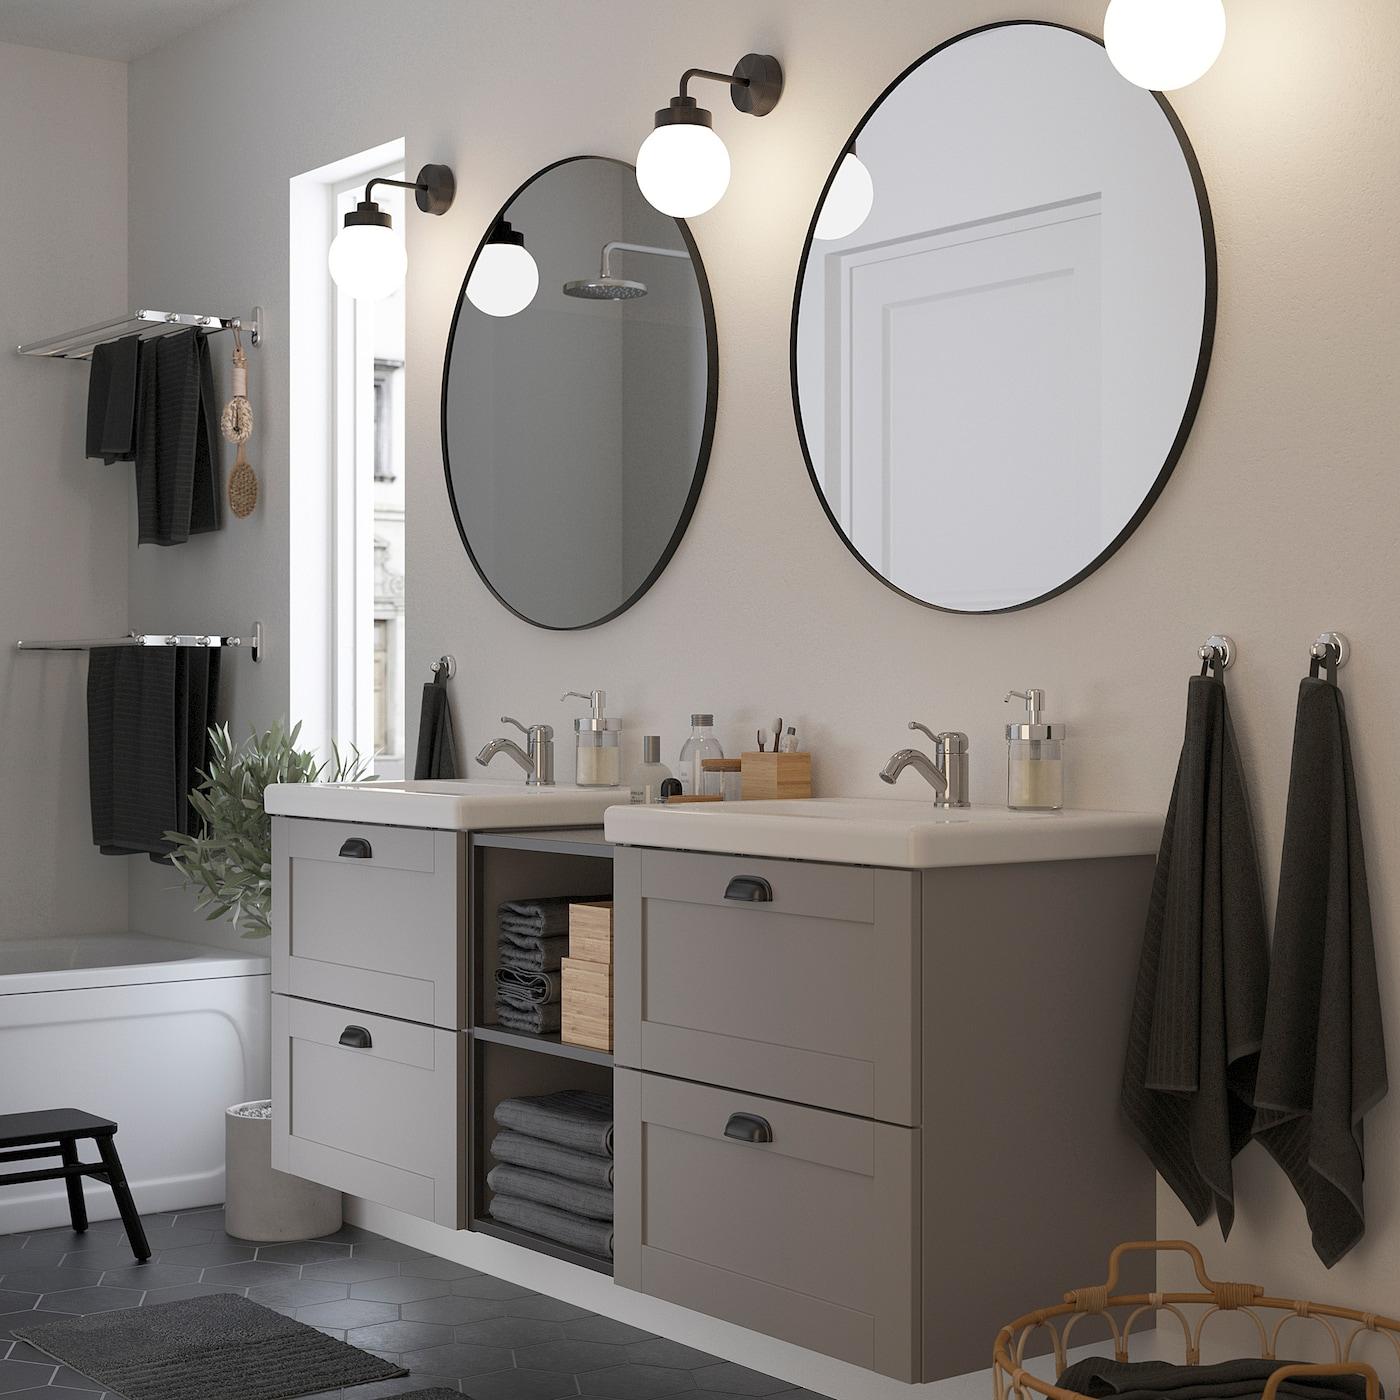 ENHET / TVÄLLEN Bathroom furniture, set of 15, grey frame/anthracite Lillsvan tap, 164x43x65 cm